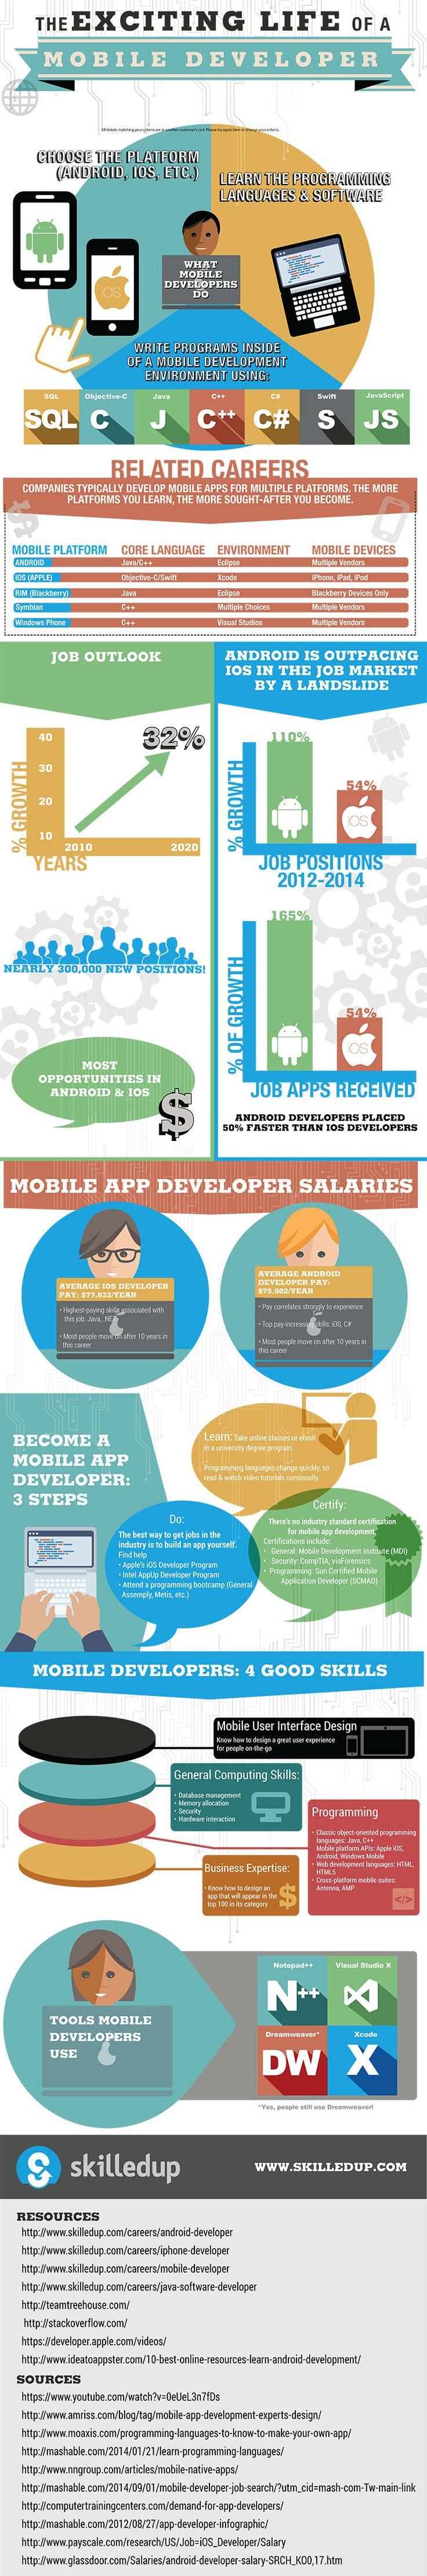 mobile developer apps coding coder